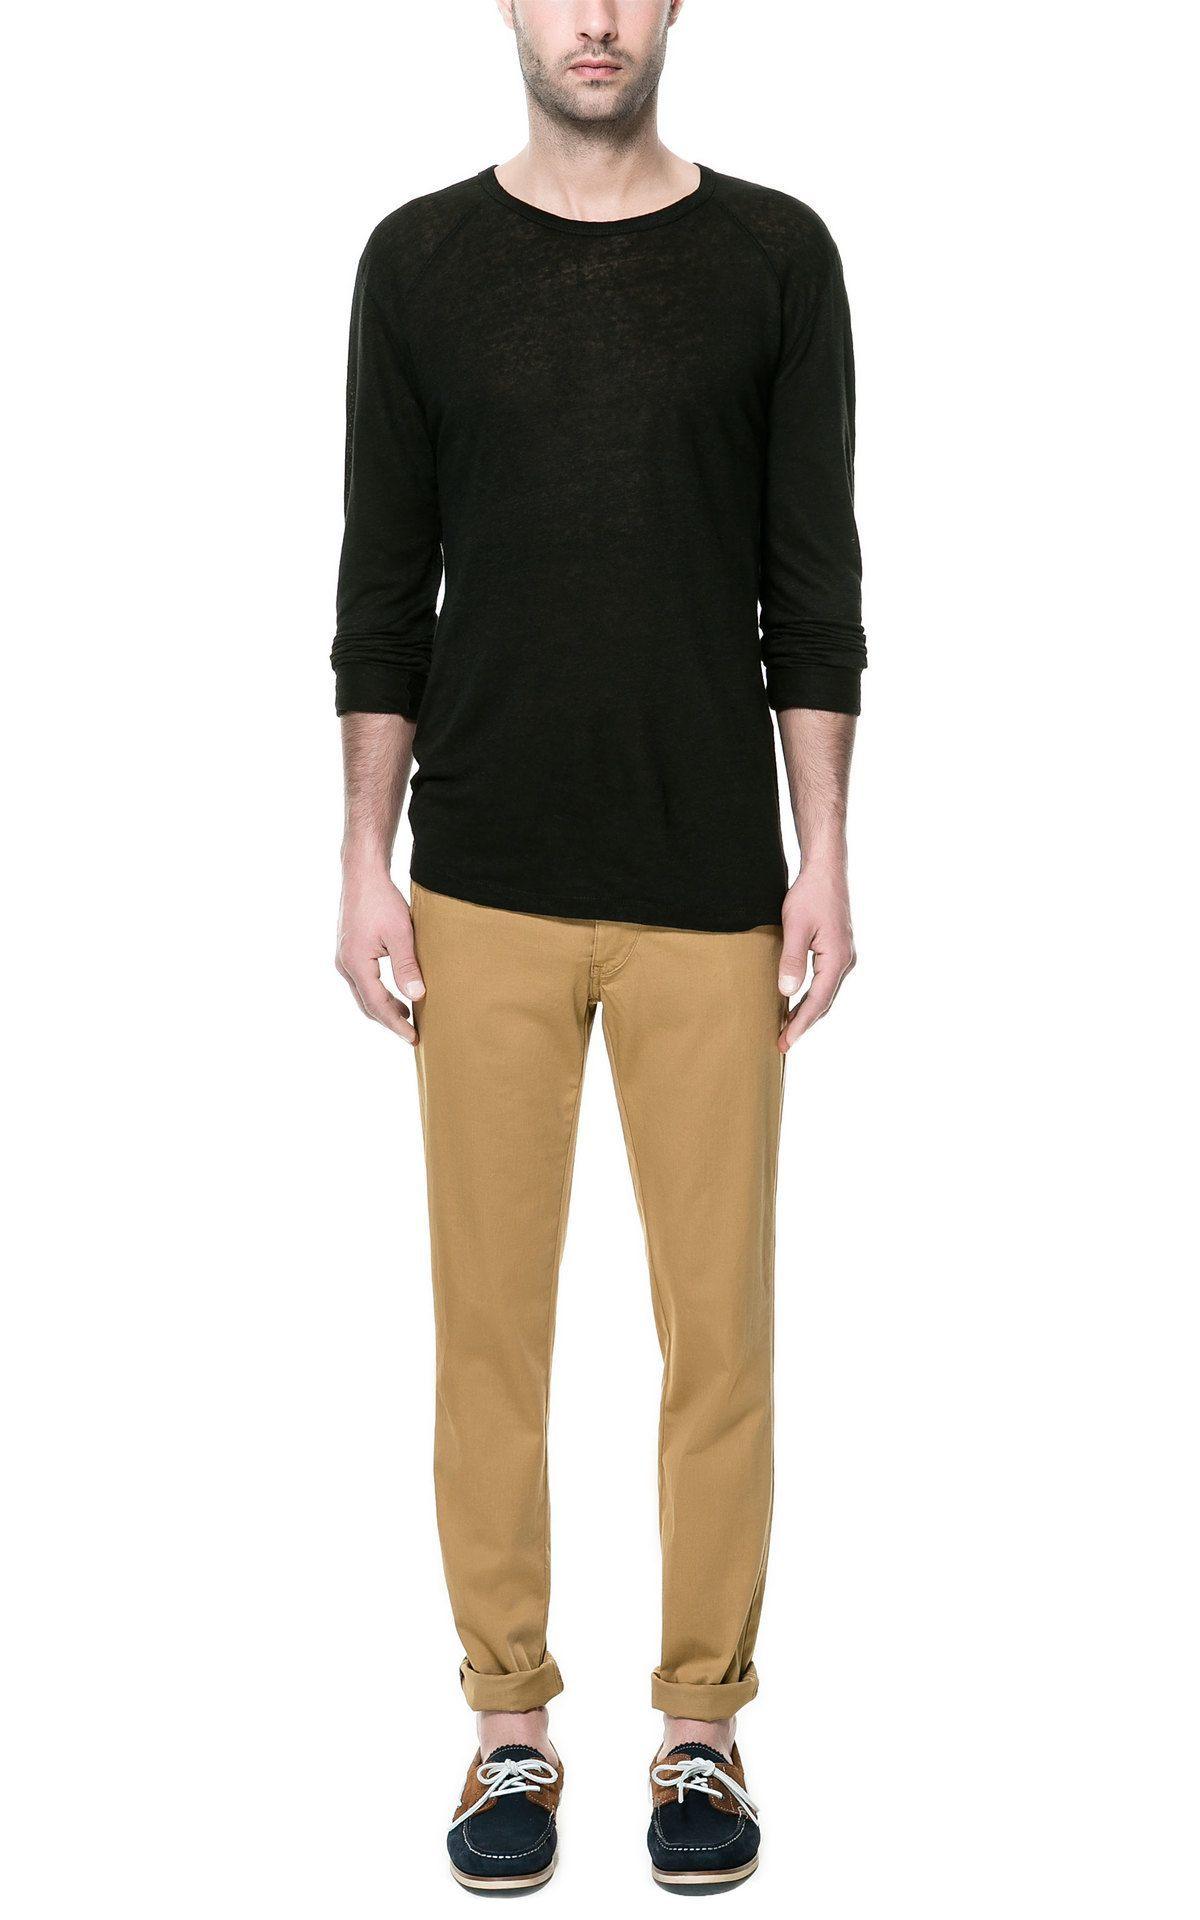 tendencias-pantalon-hombre-verano-2013-zara-pastel